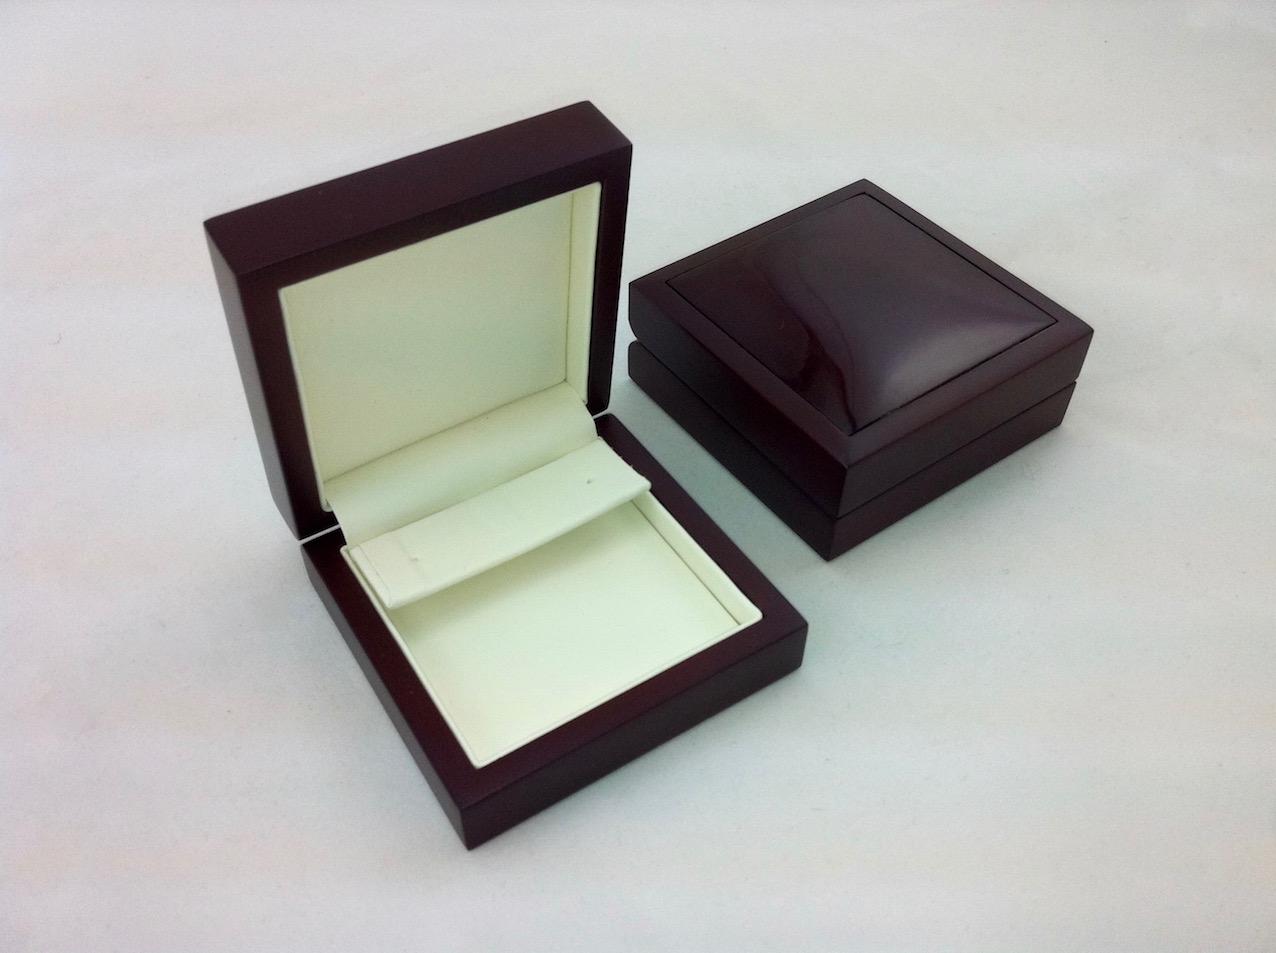 Huge earring insert in Luxury timber box